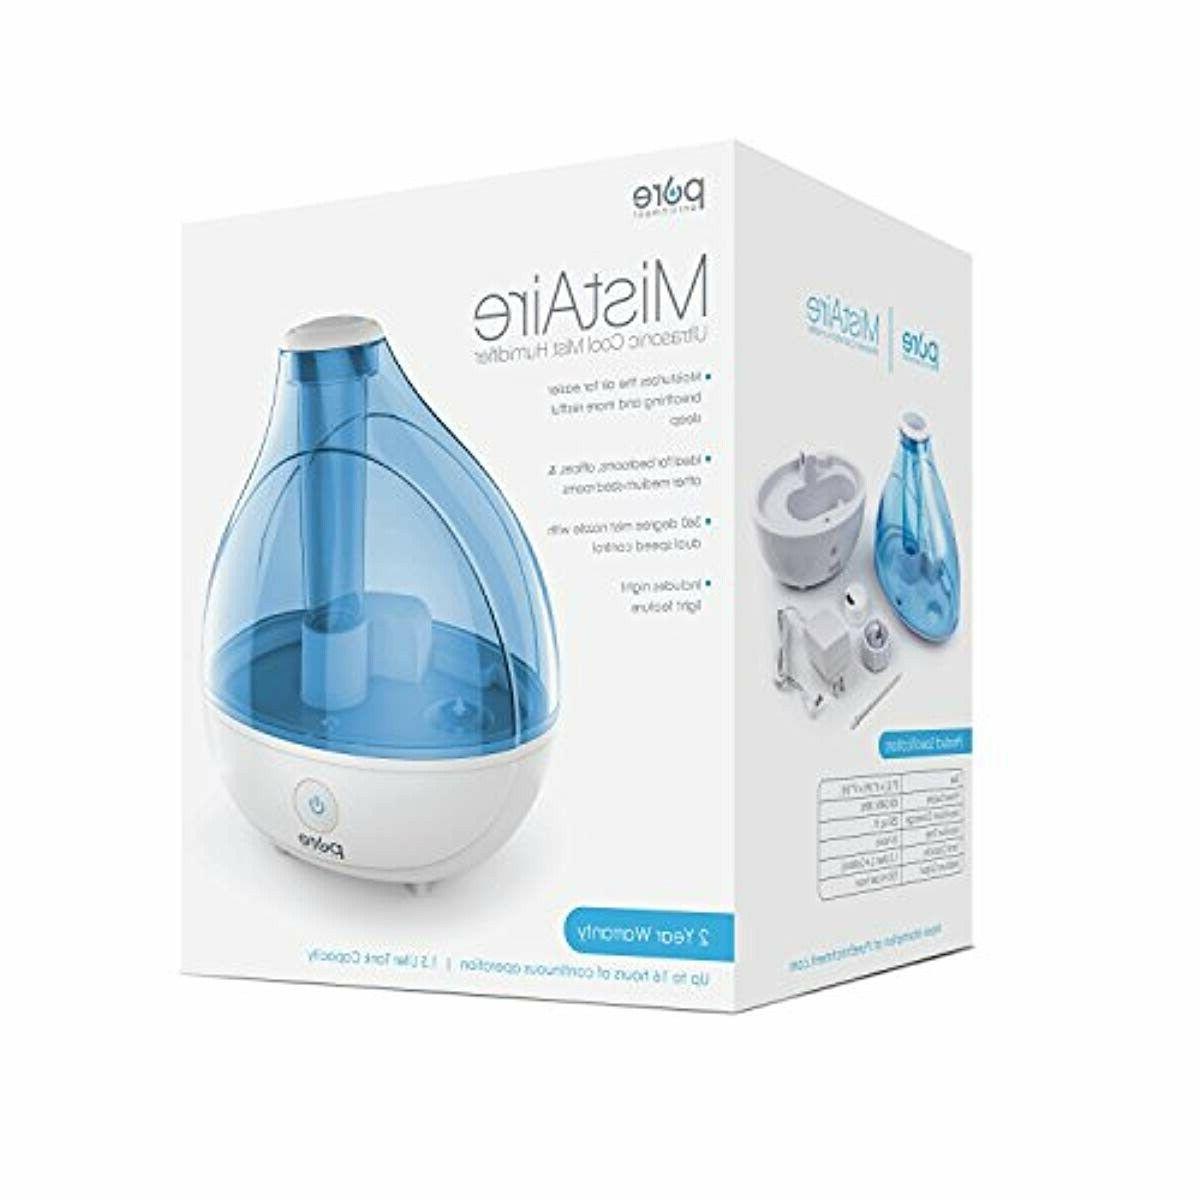 Pure MistAire Ultrasonic Cool Mist Humidifier - Premium Humidifying